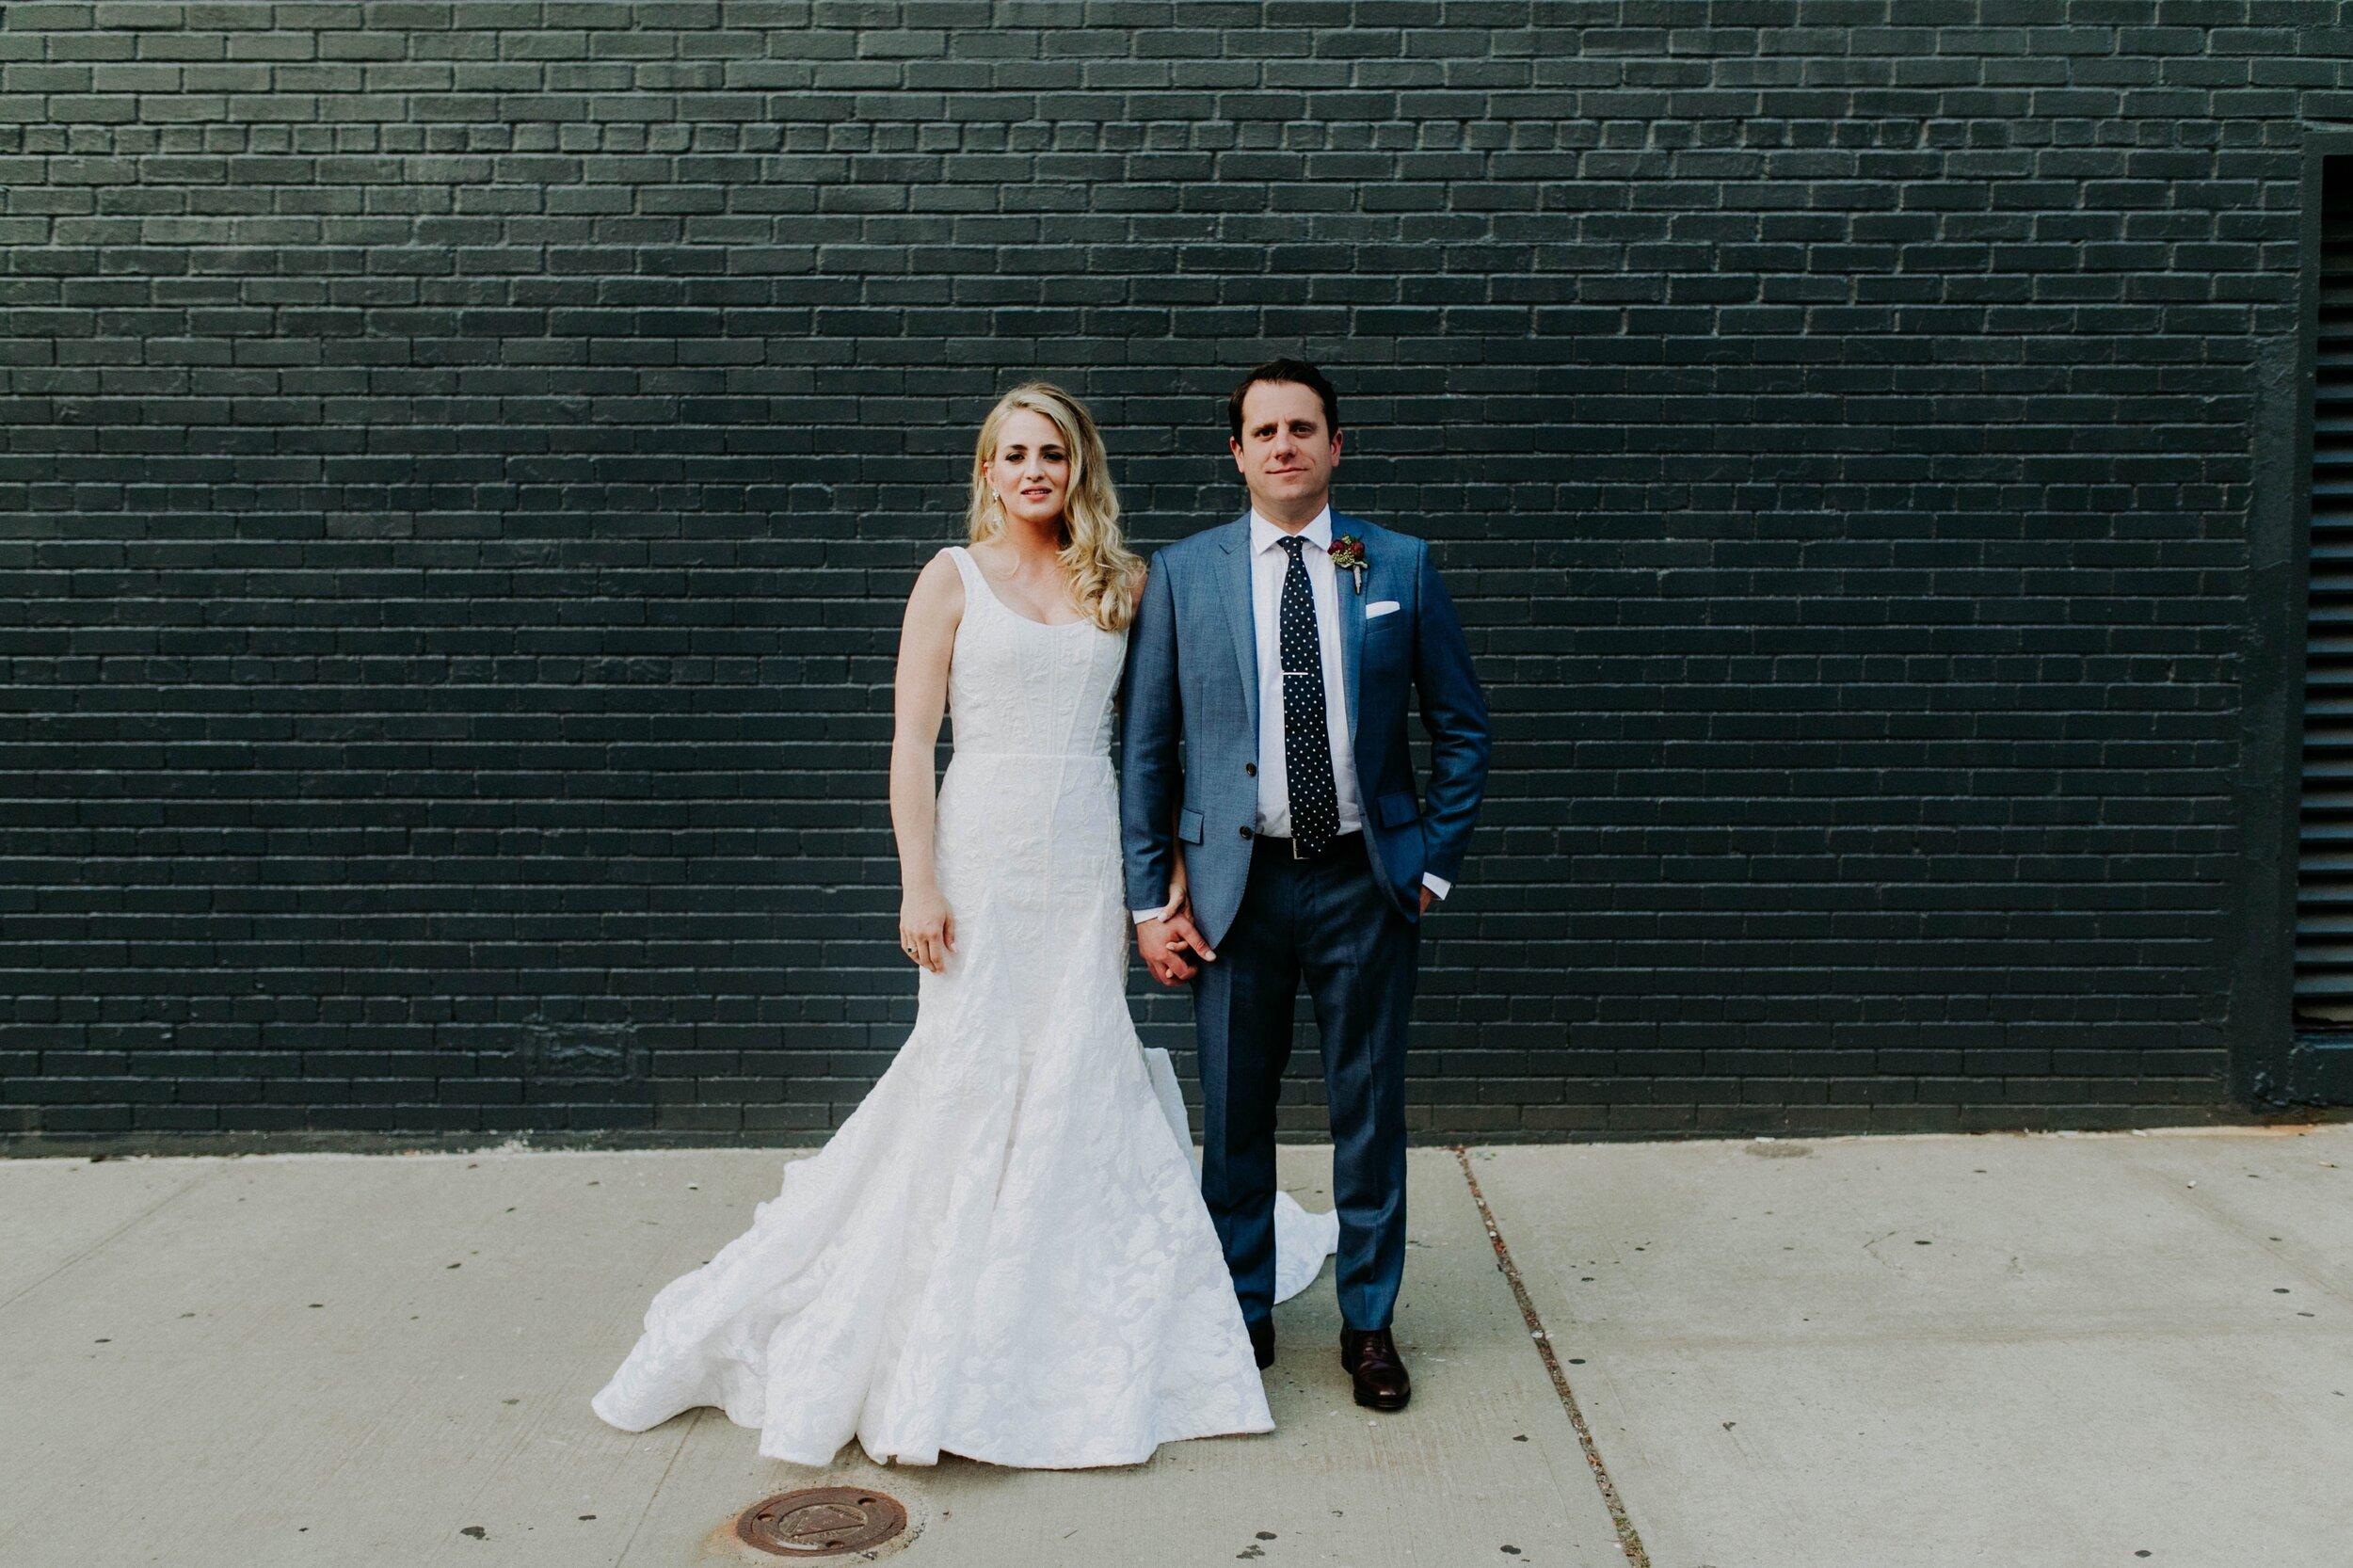 brooklyn-wedding-photographer-amber-gress-0194-.JPG